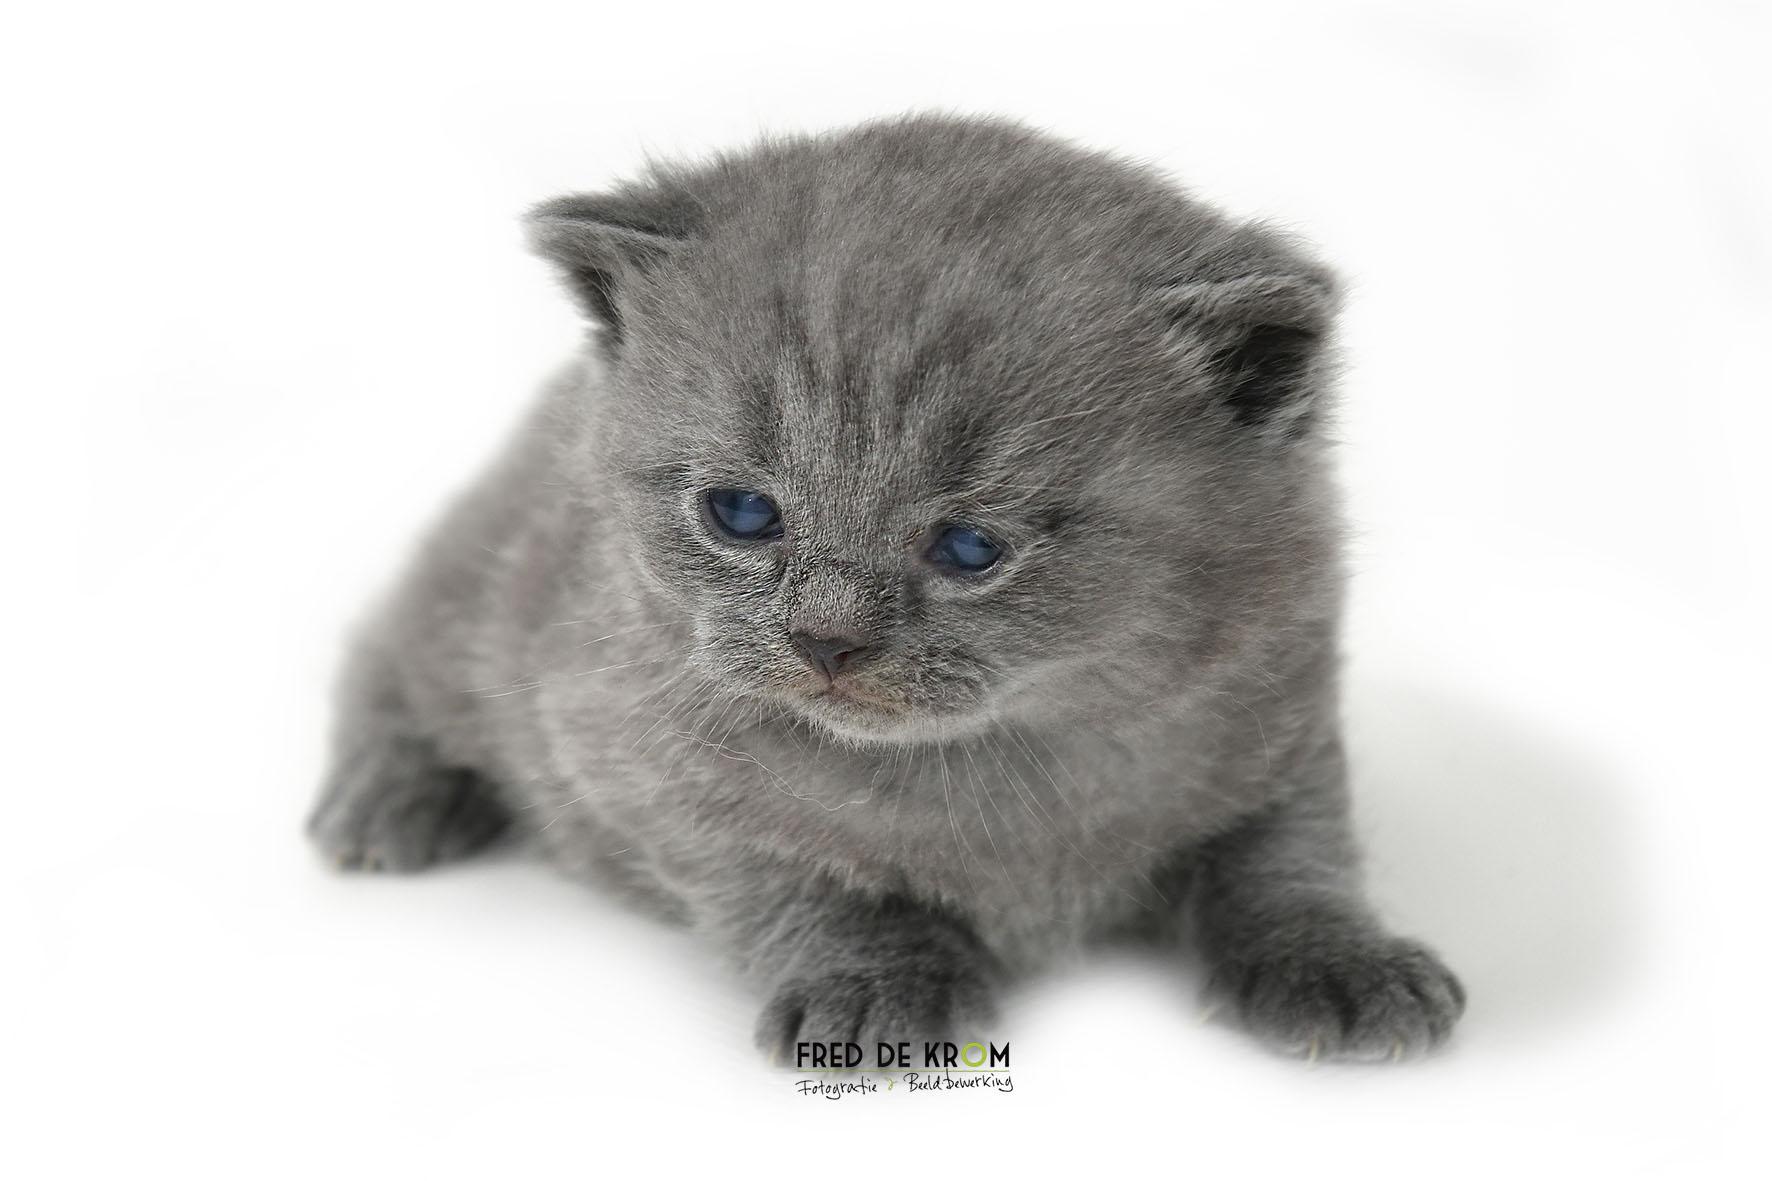 Britse korthaar kitten, grijs, liggend, witte achtergrond.